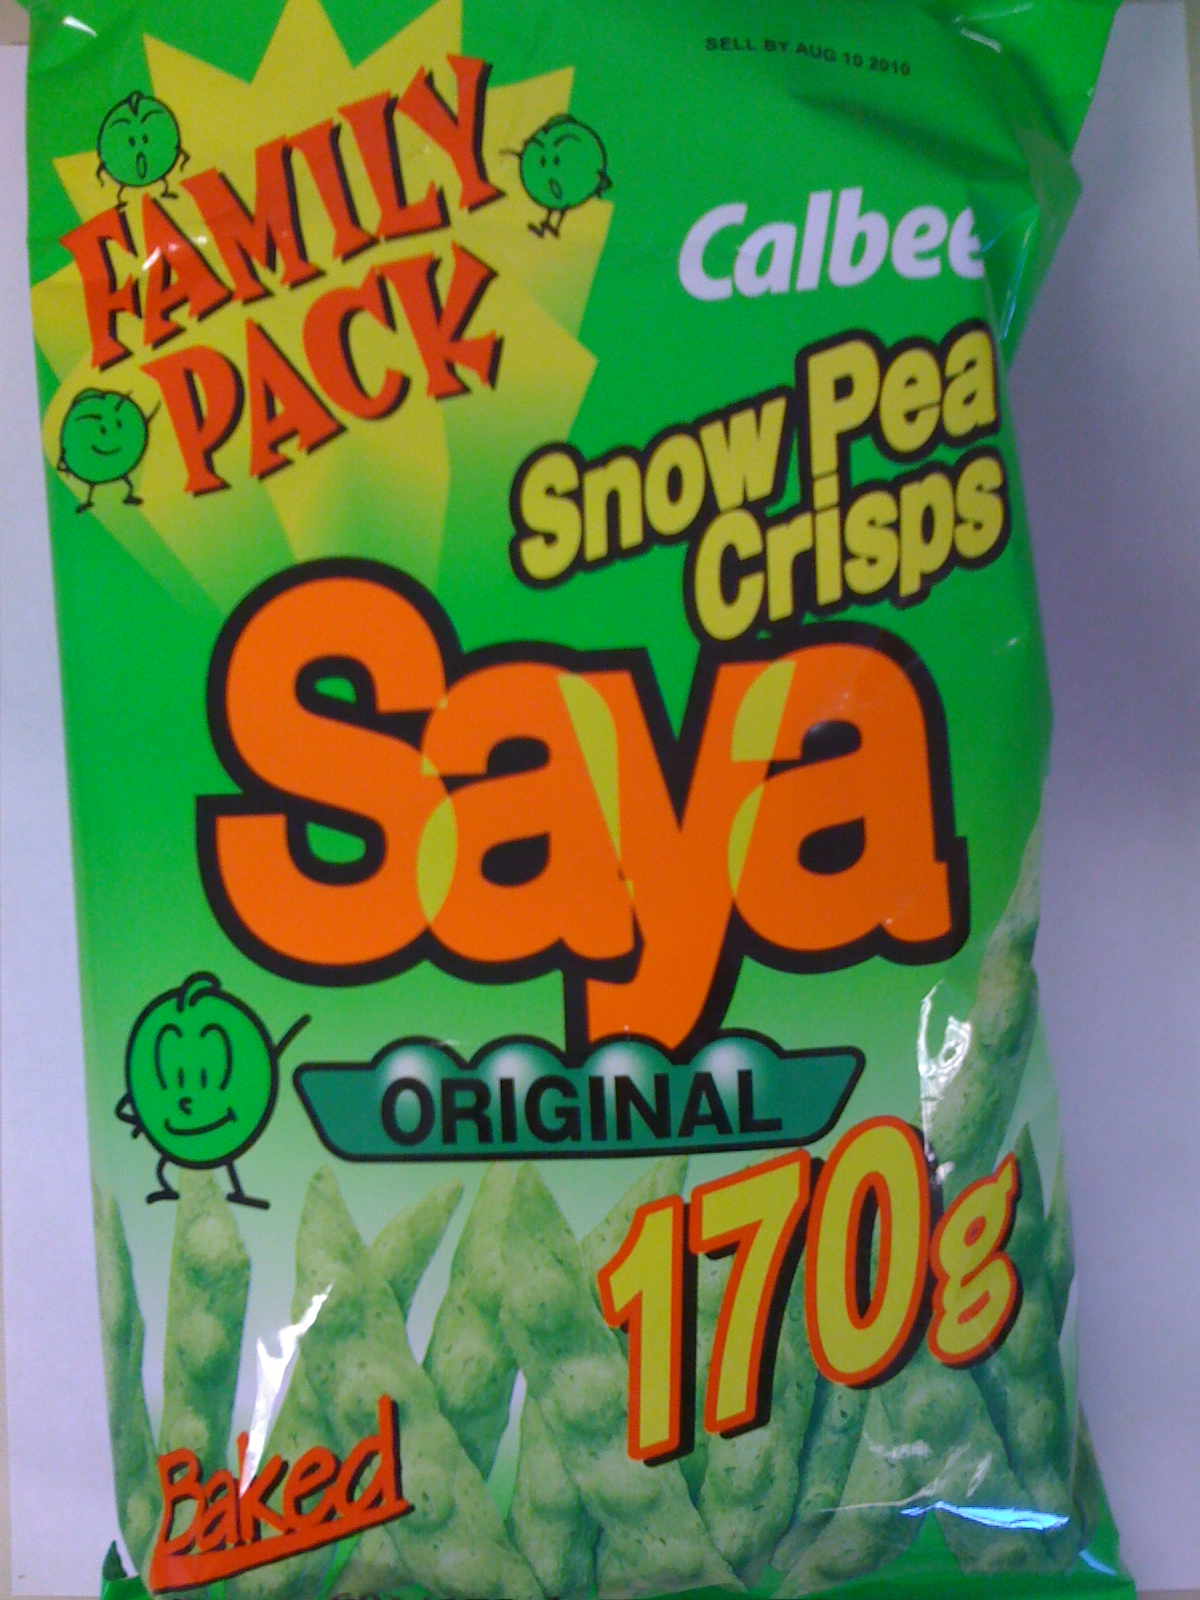 Saya snow pea crisps